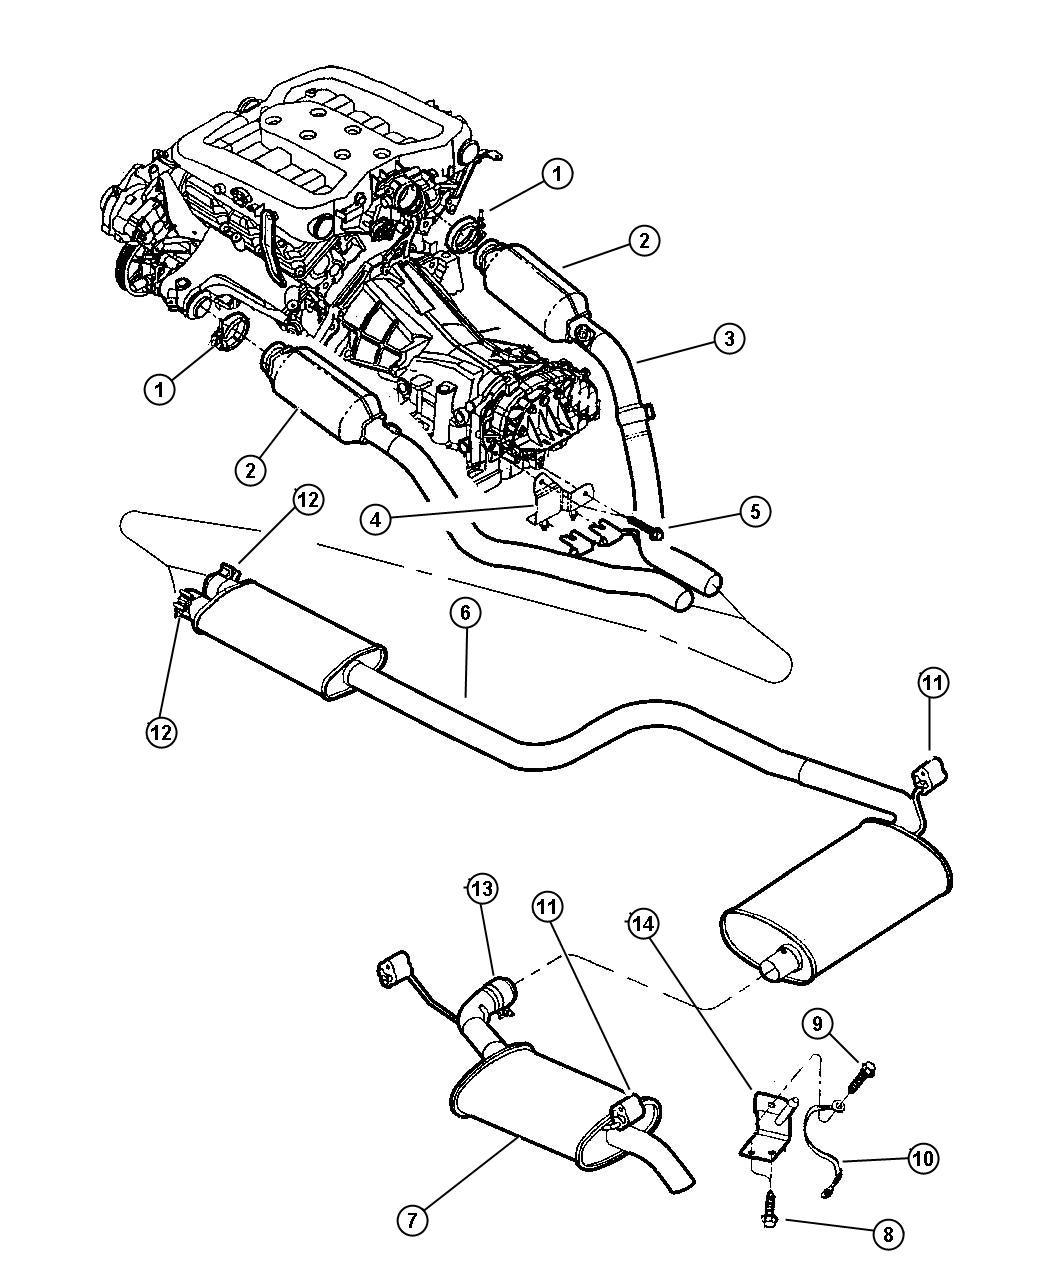 2001 chrysler concorde engine diagram